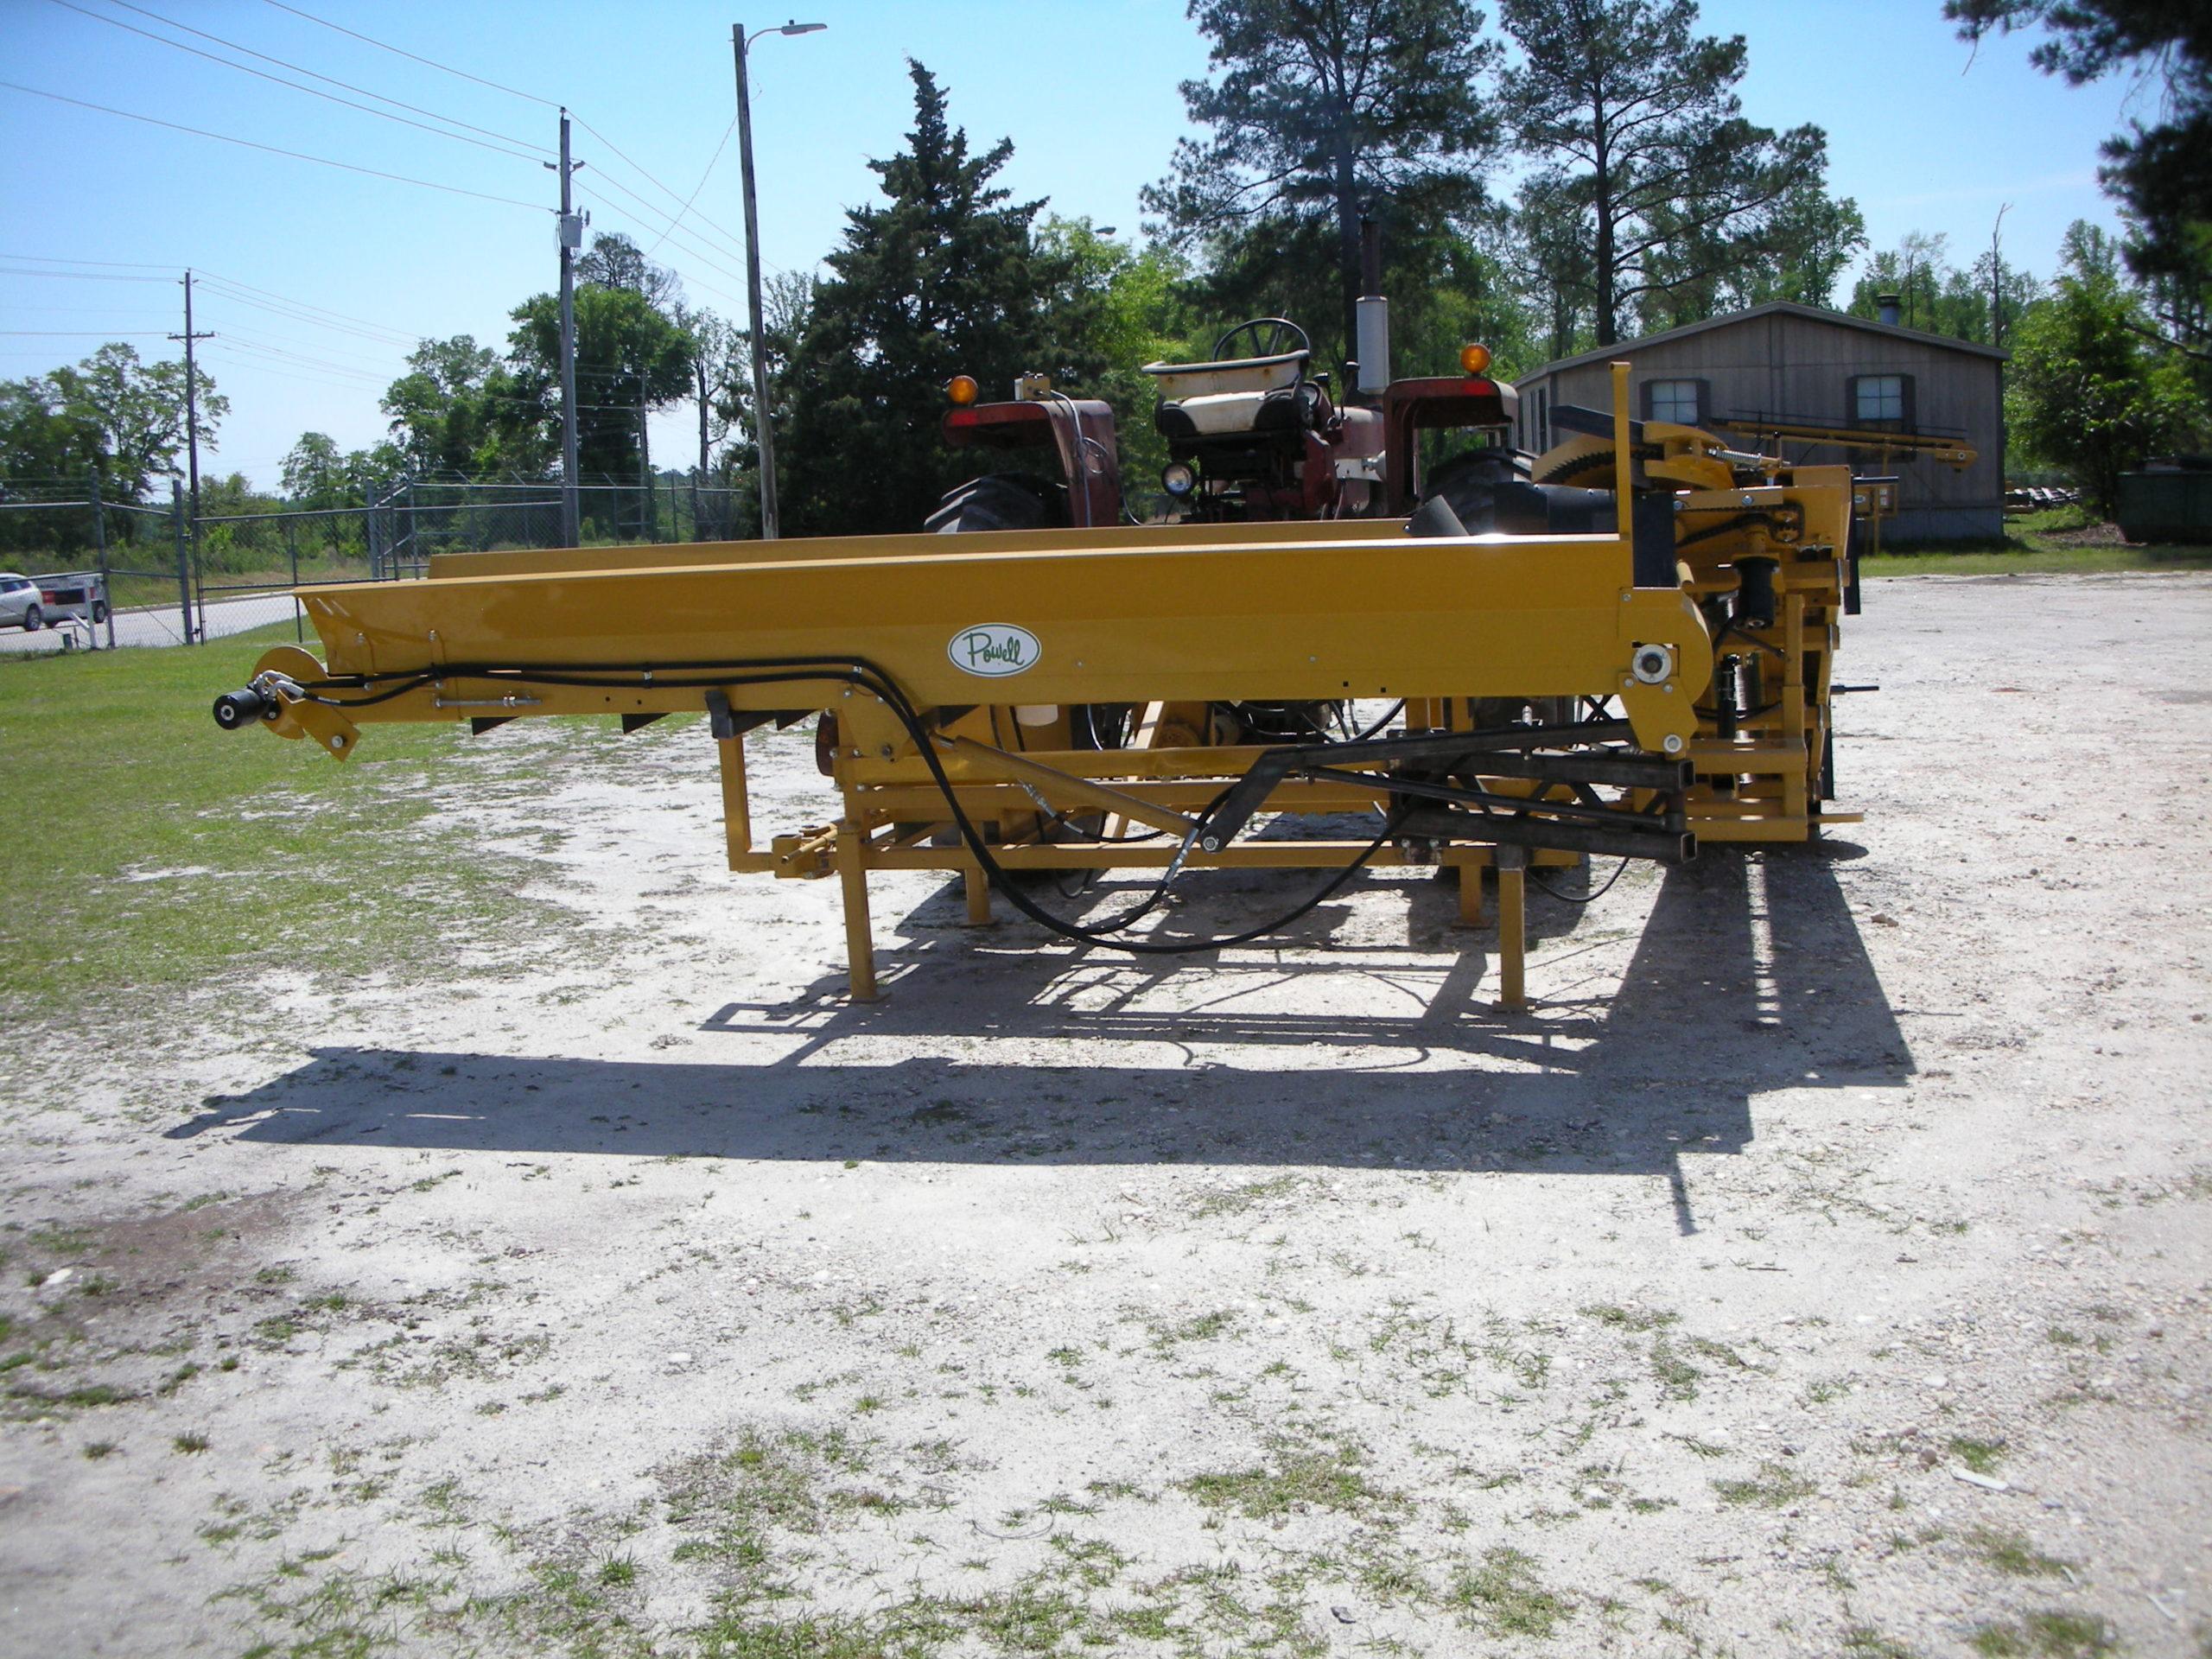 CBD Hemp Handler | Single Row Hemp Harvester | Powell Hemp Machine | Marco Manufacturing | Hemp Cutter